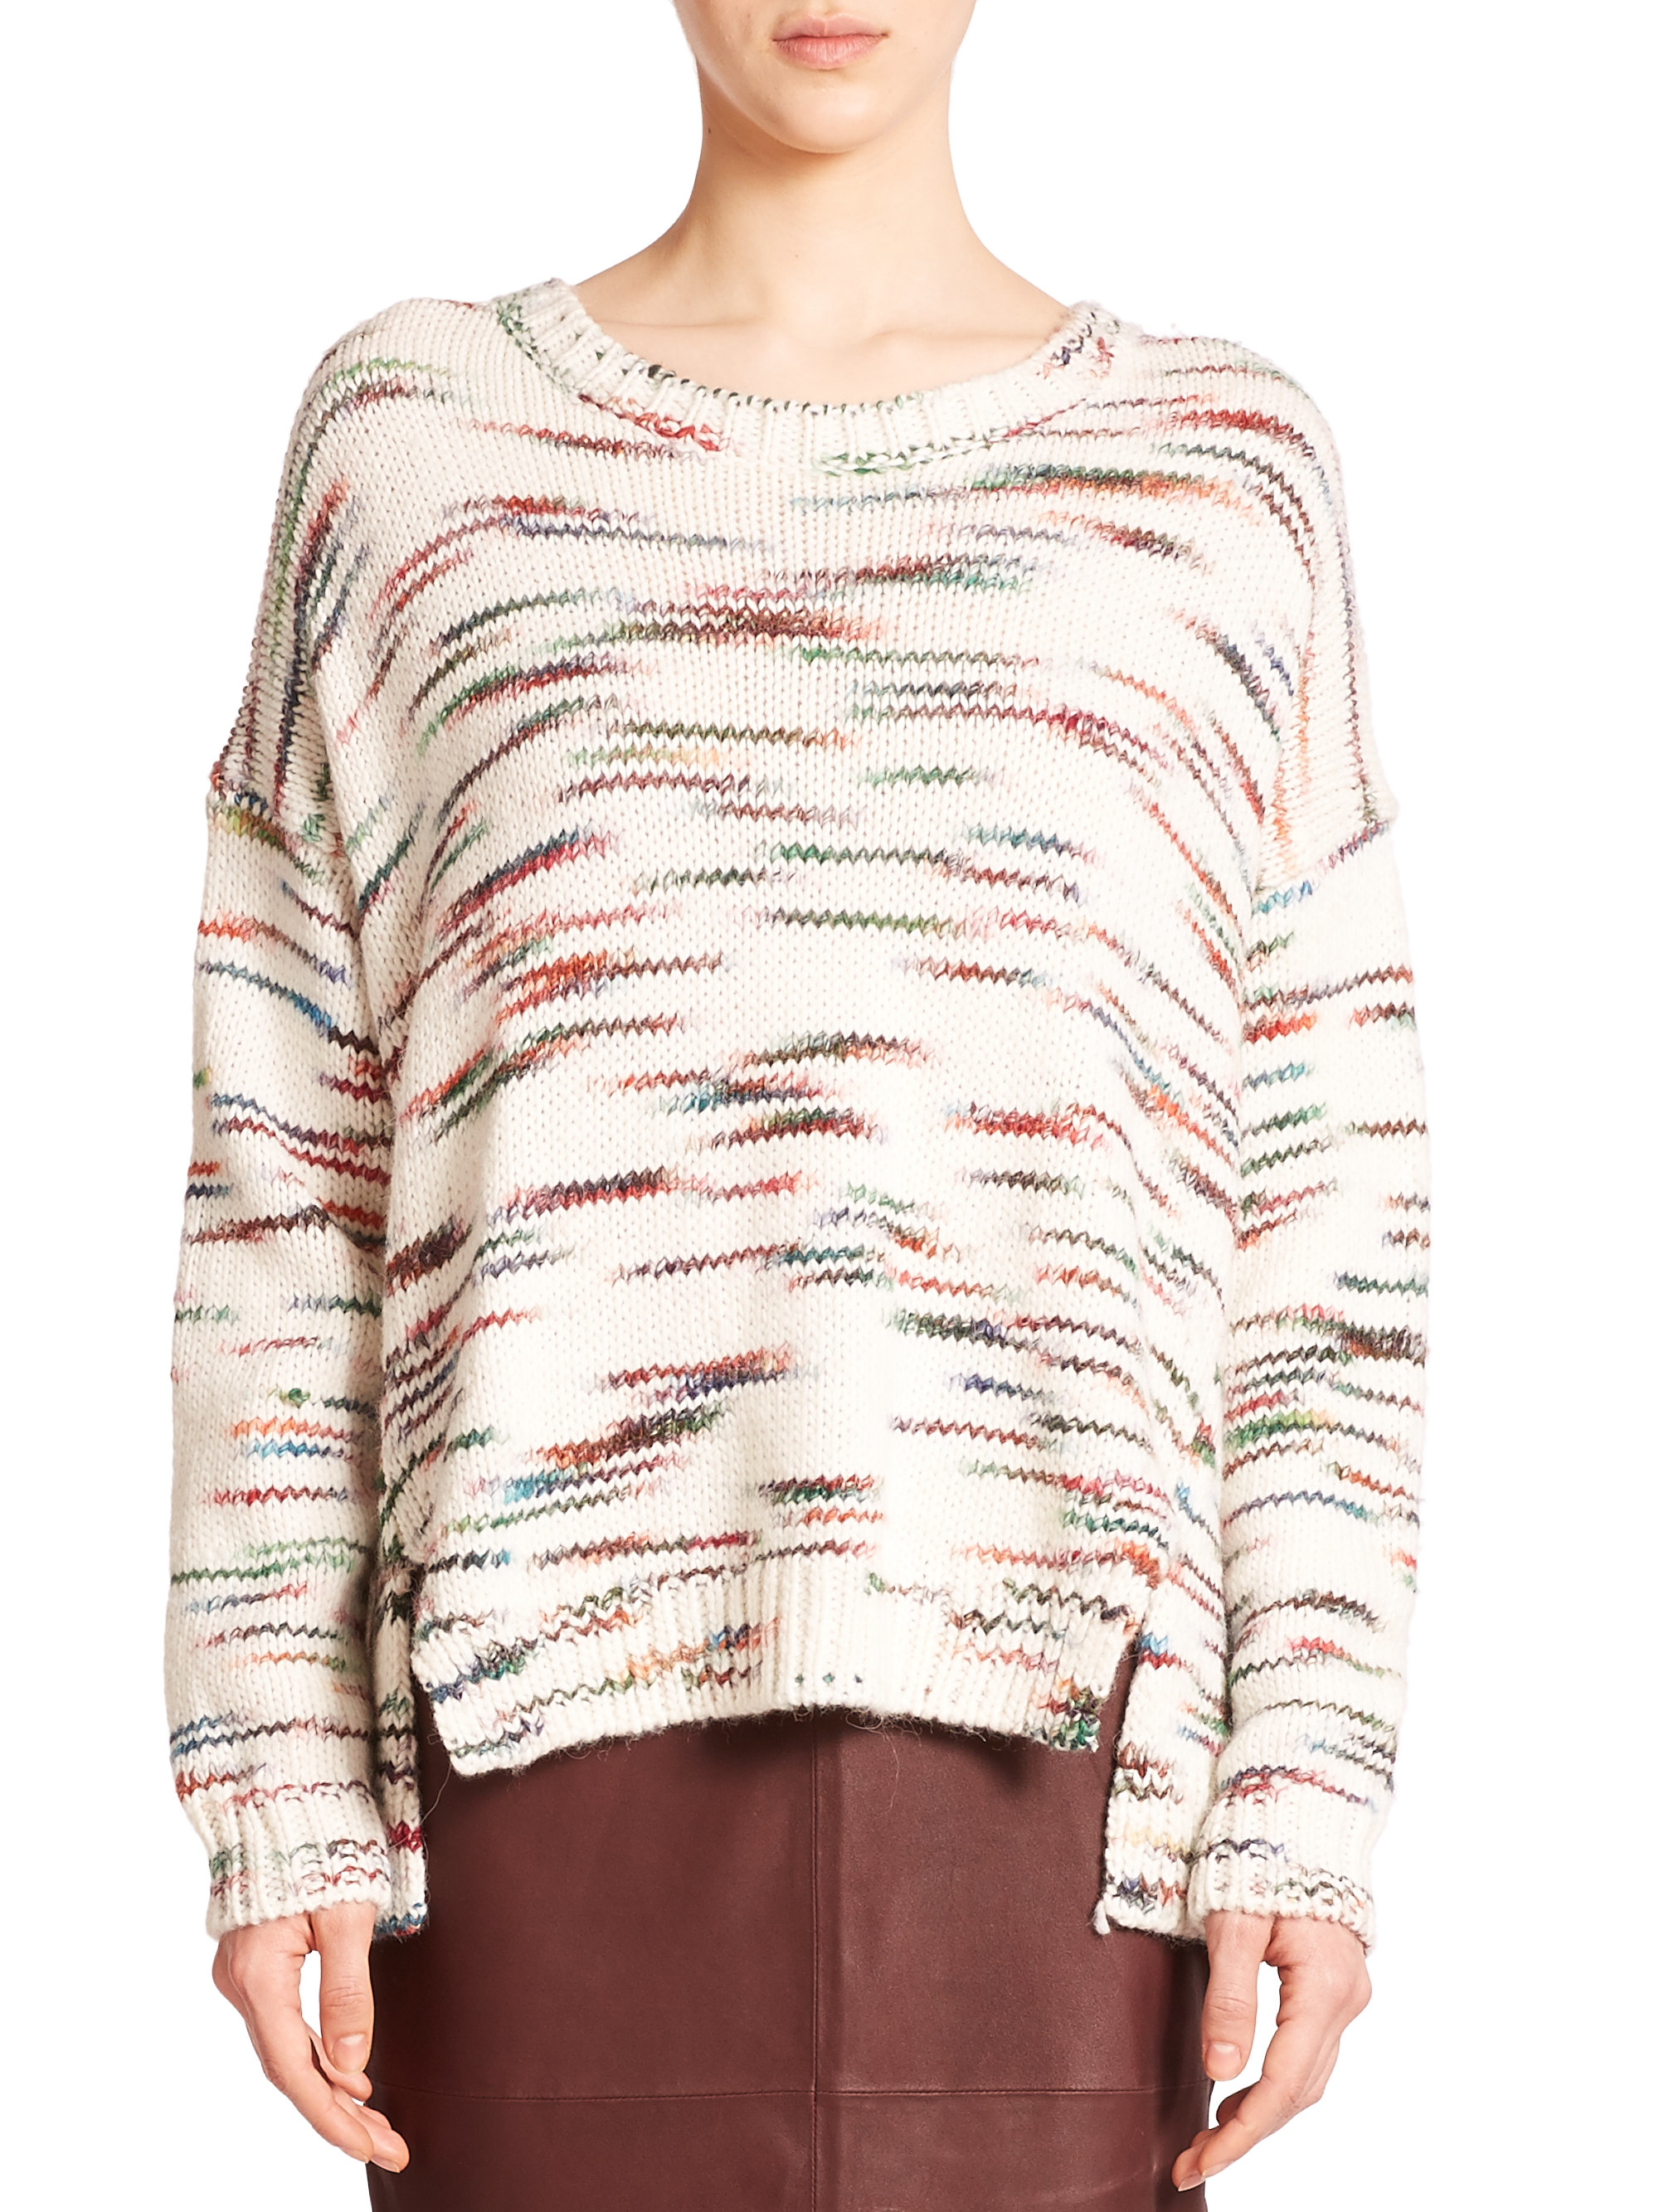 Space James Knit Sweater Lyst Dye Elizabeth And uTkiwOPXZ